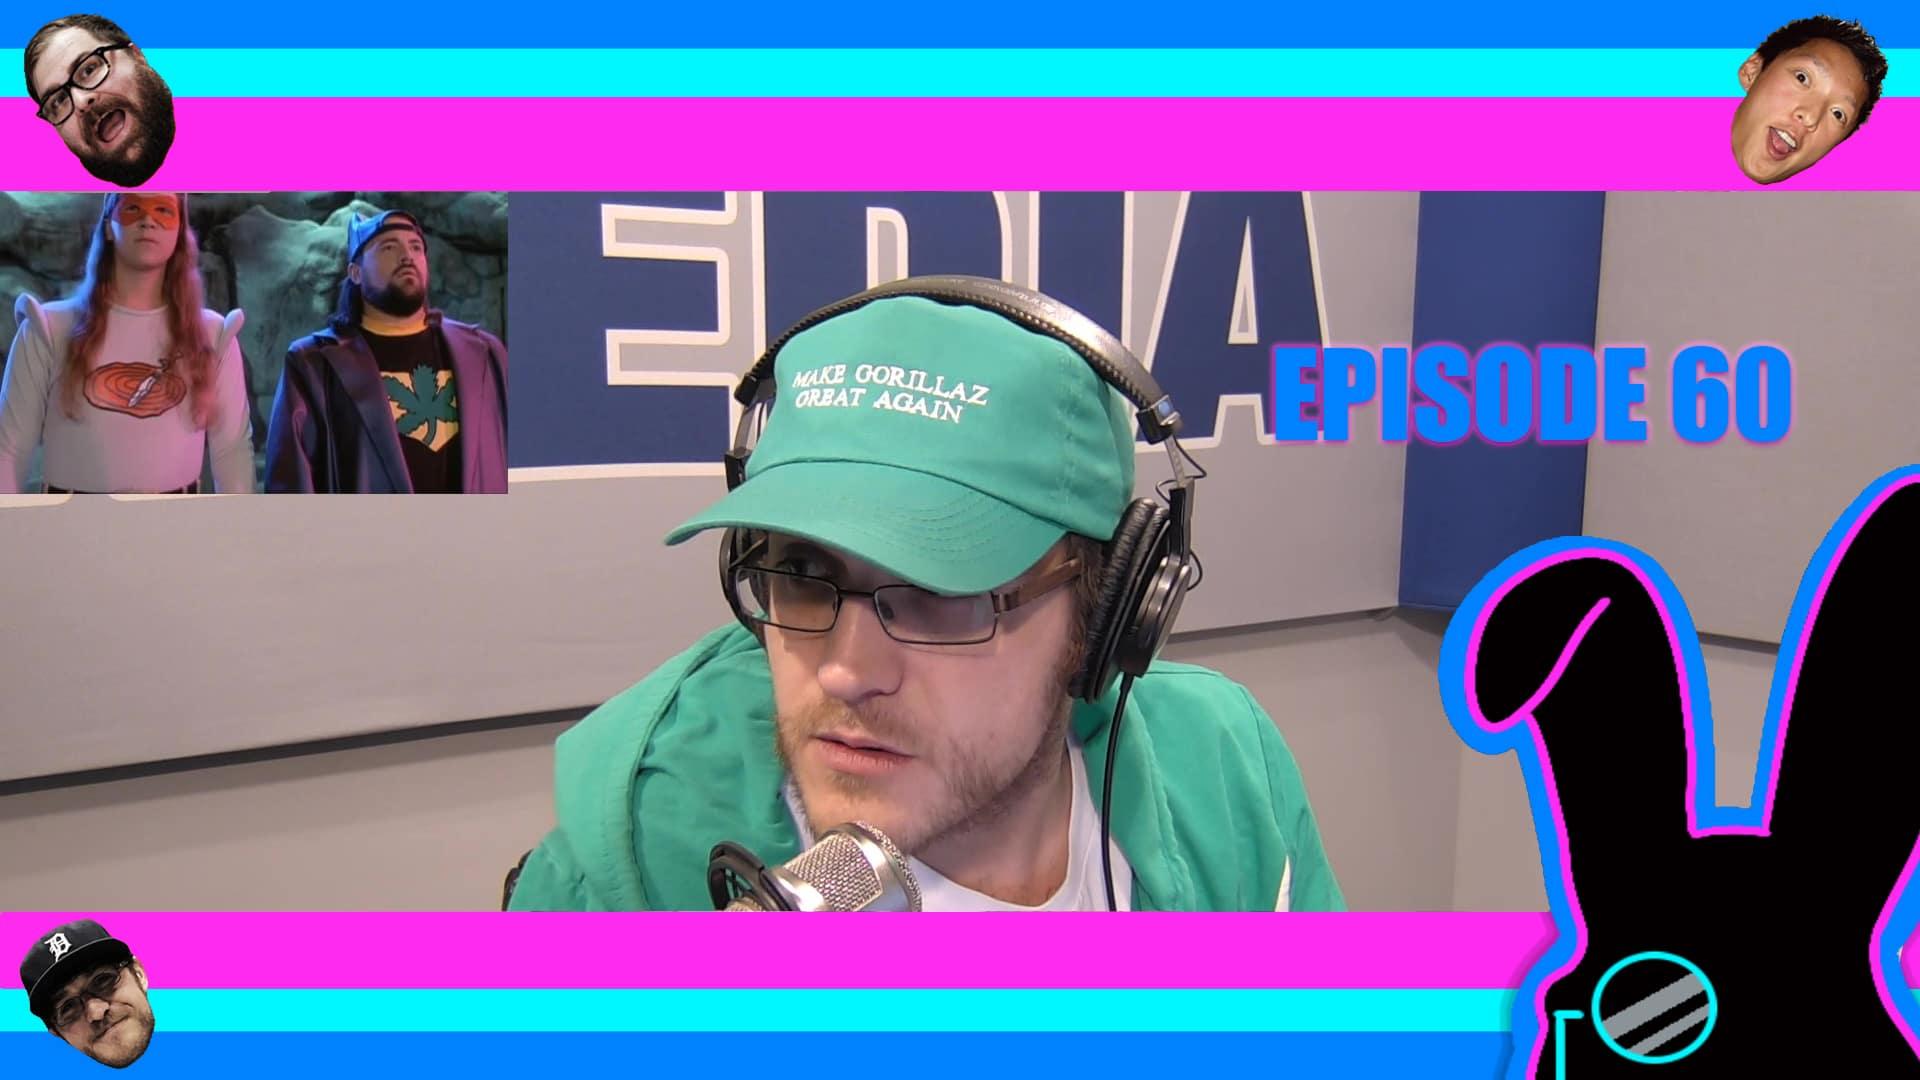 Geektainment Weekly Episode 60